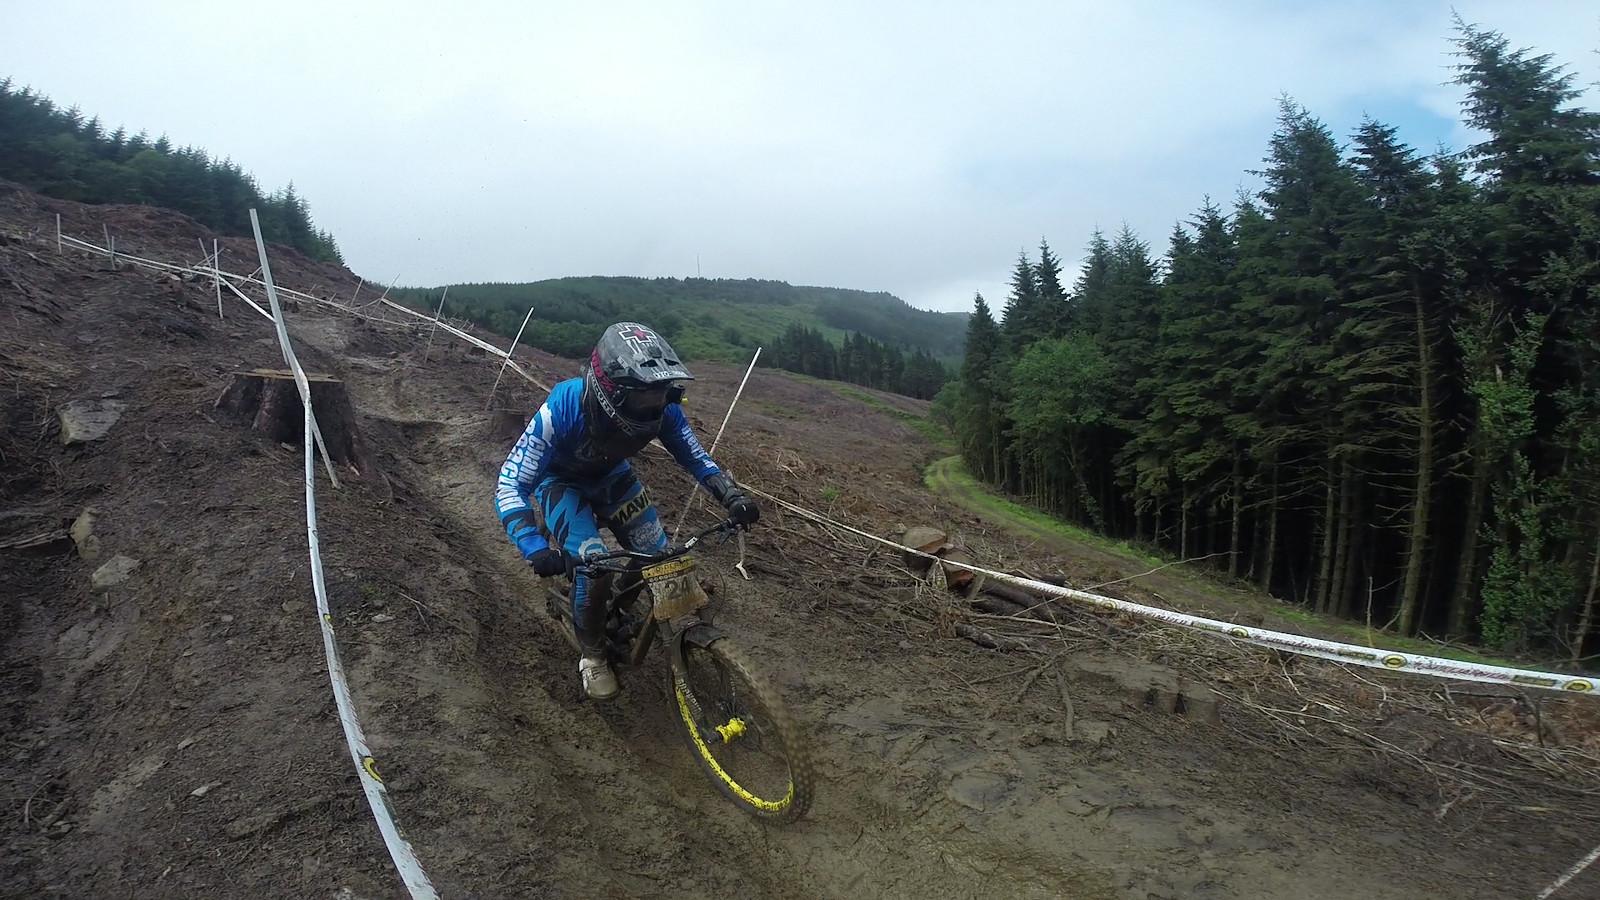 Mike Jones - Matthew Davies - Mountain Biking Pictures - Vital MTB